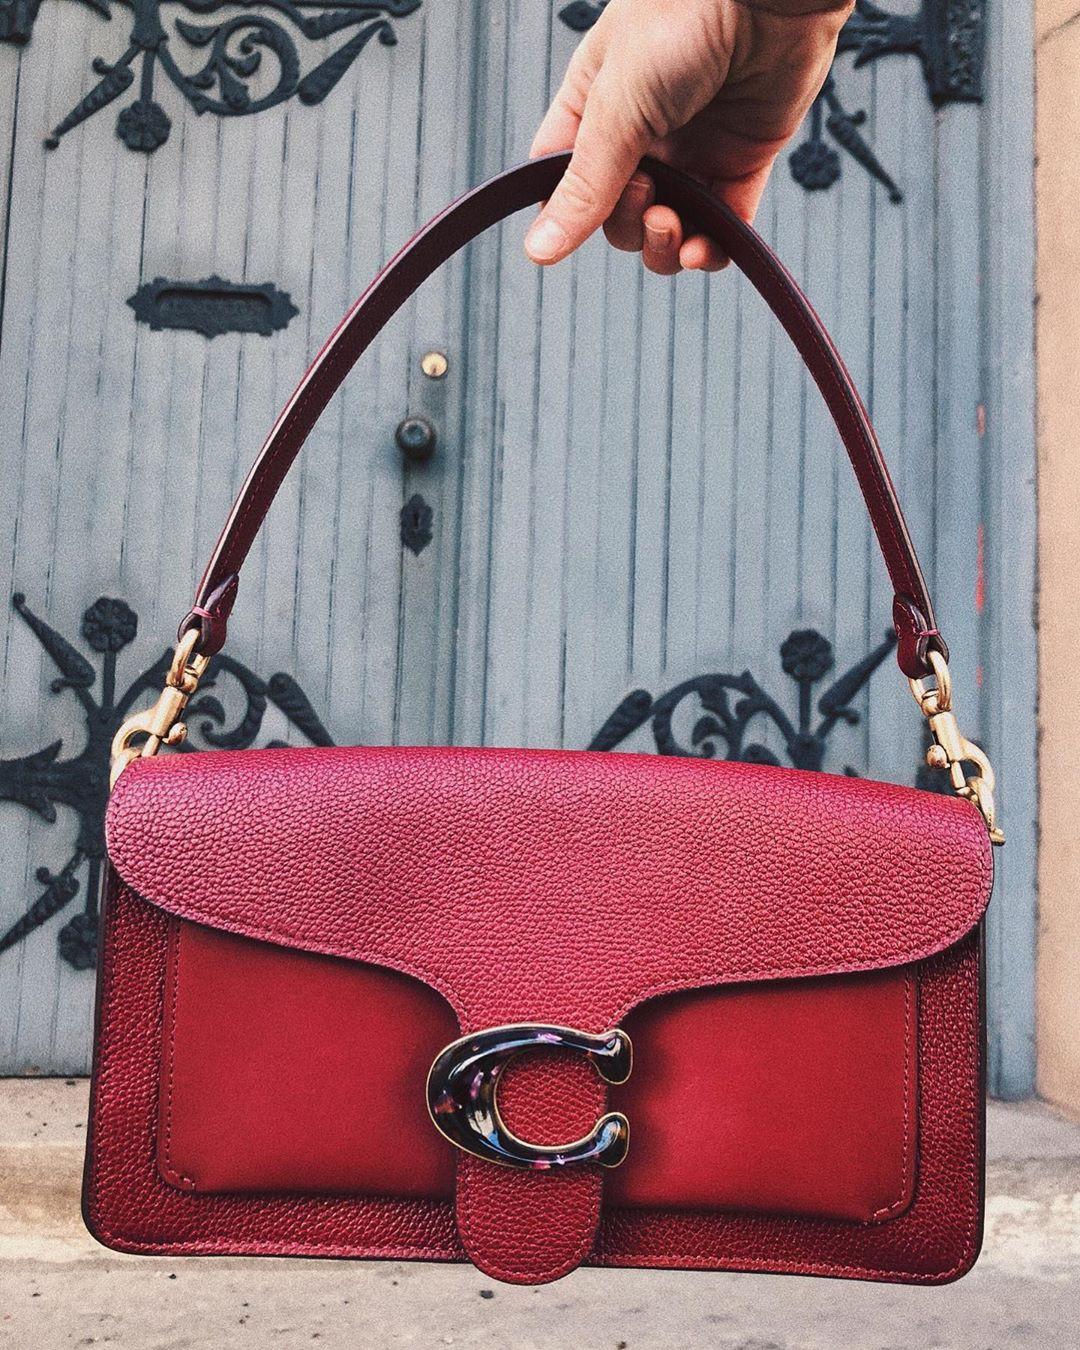 Magenta and brown fashion accessory, leather, handbag, bag